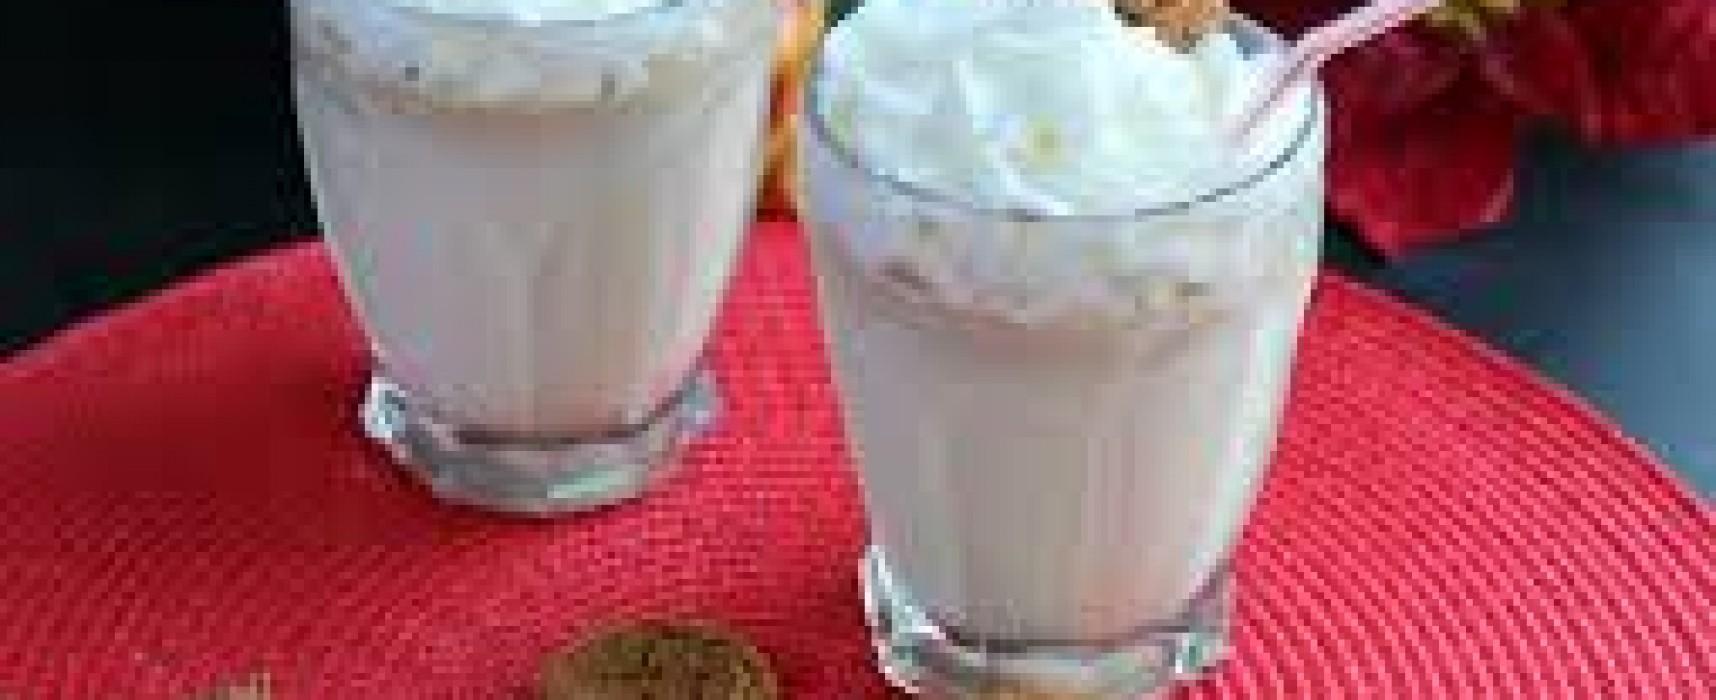 Milkshakes! 5 interesting recipes to follow!